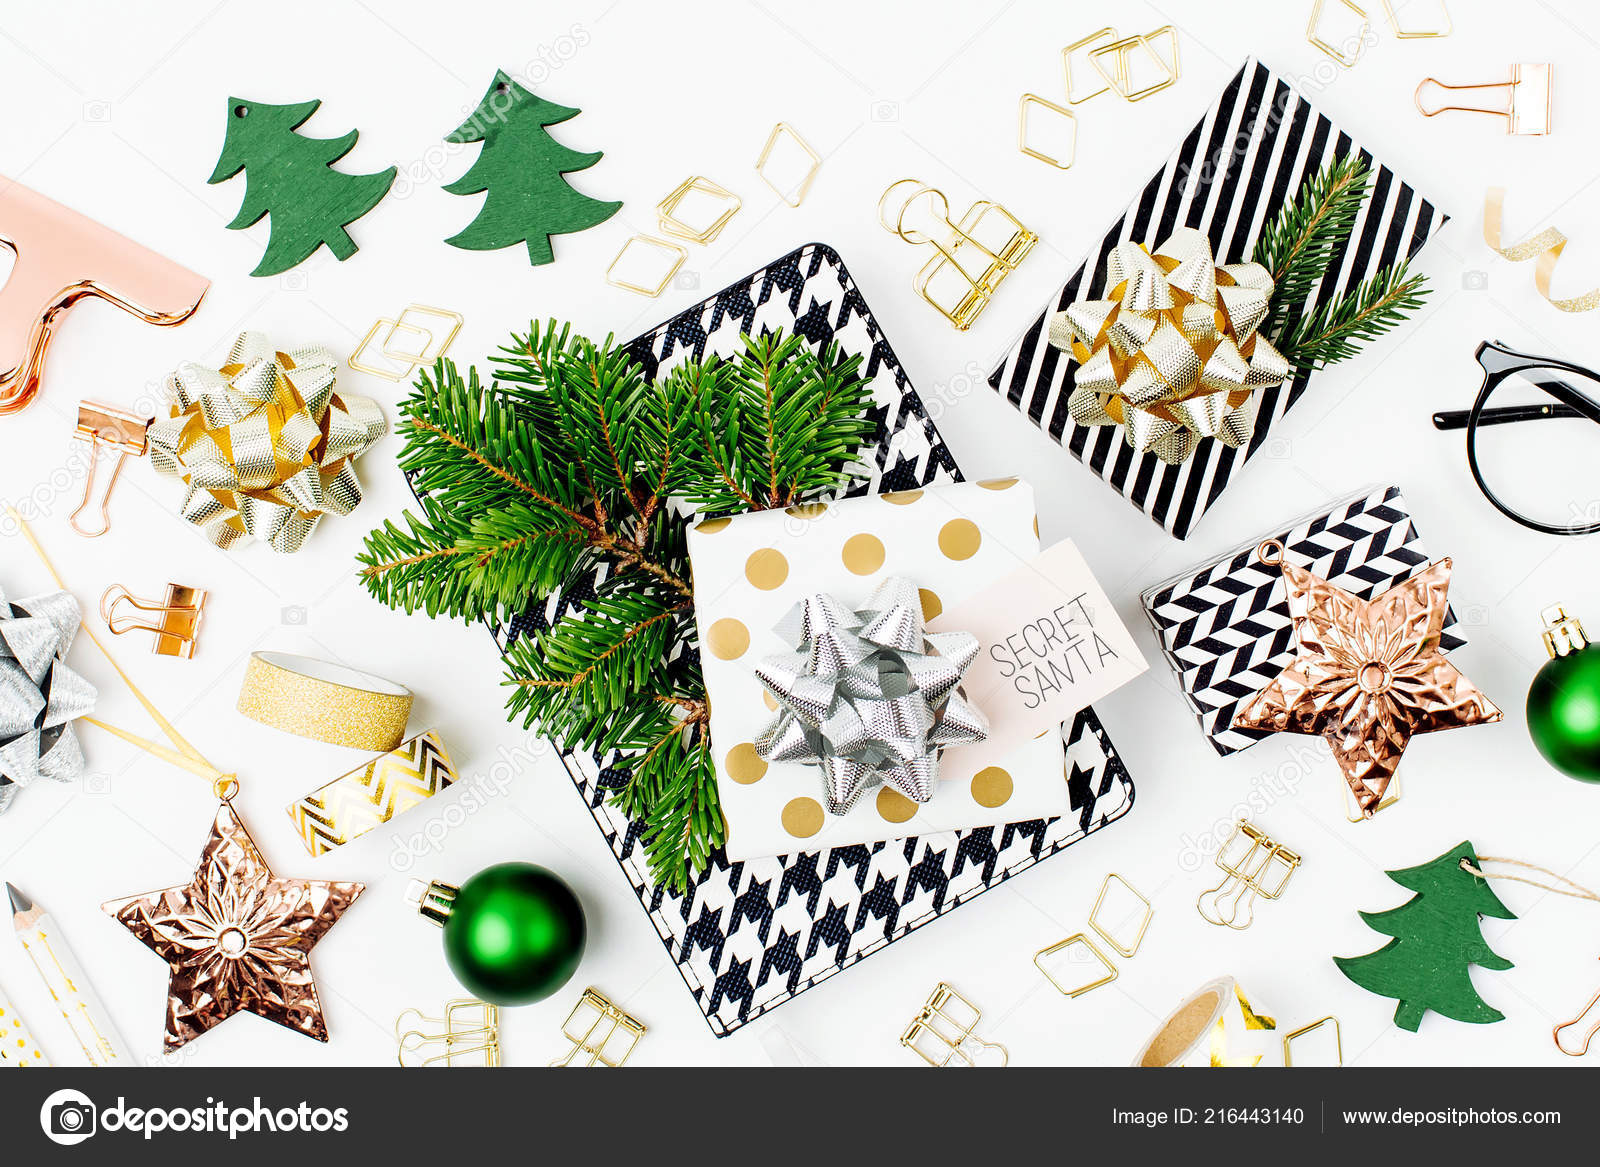 Christmas Business Decorations.Christmas Winter Decorations Business Stationery Gifts